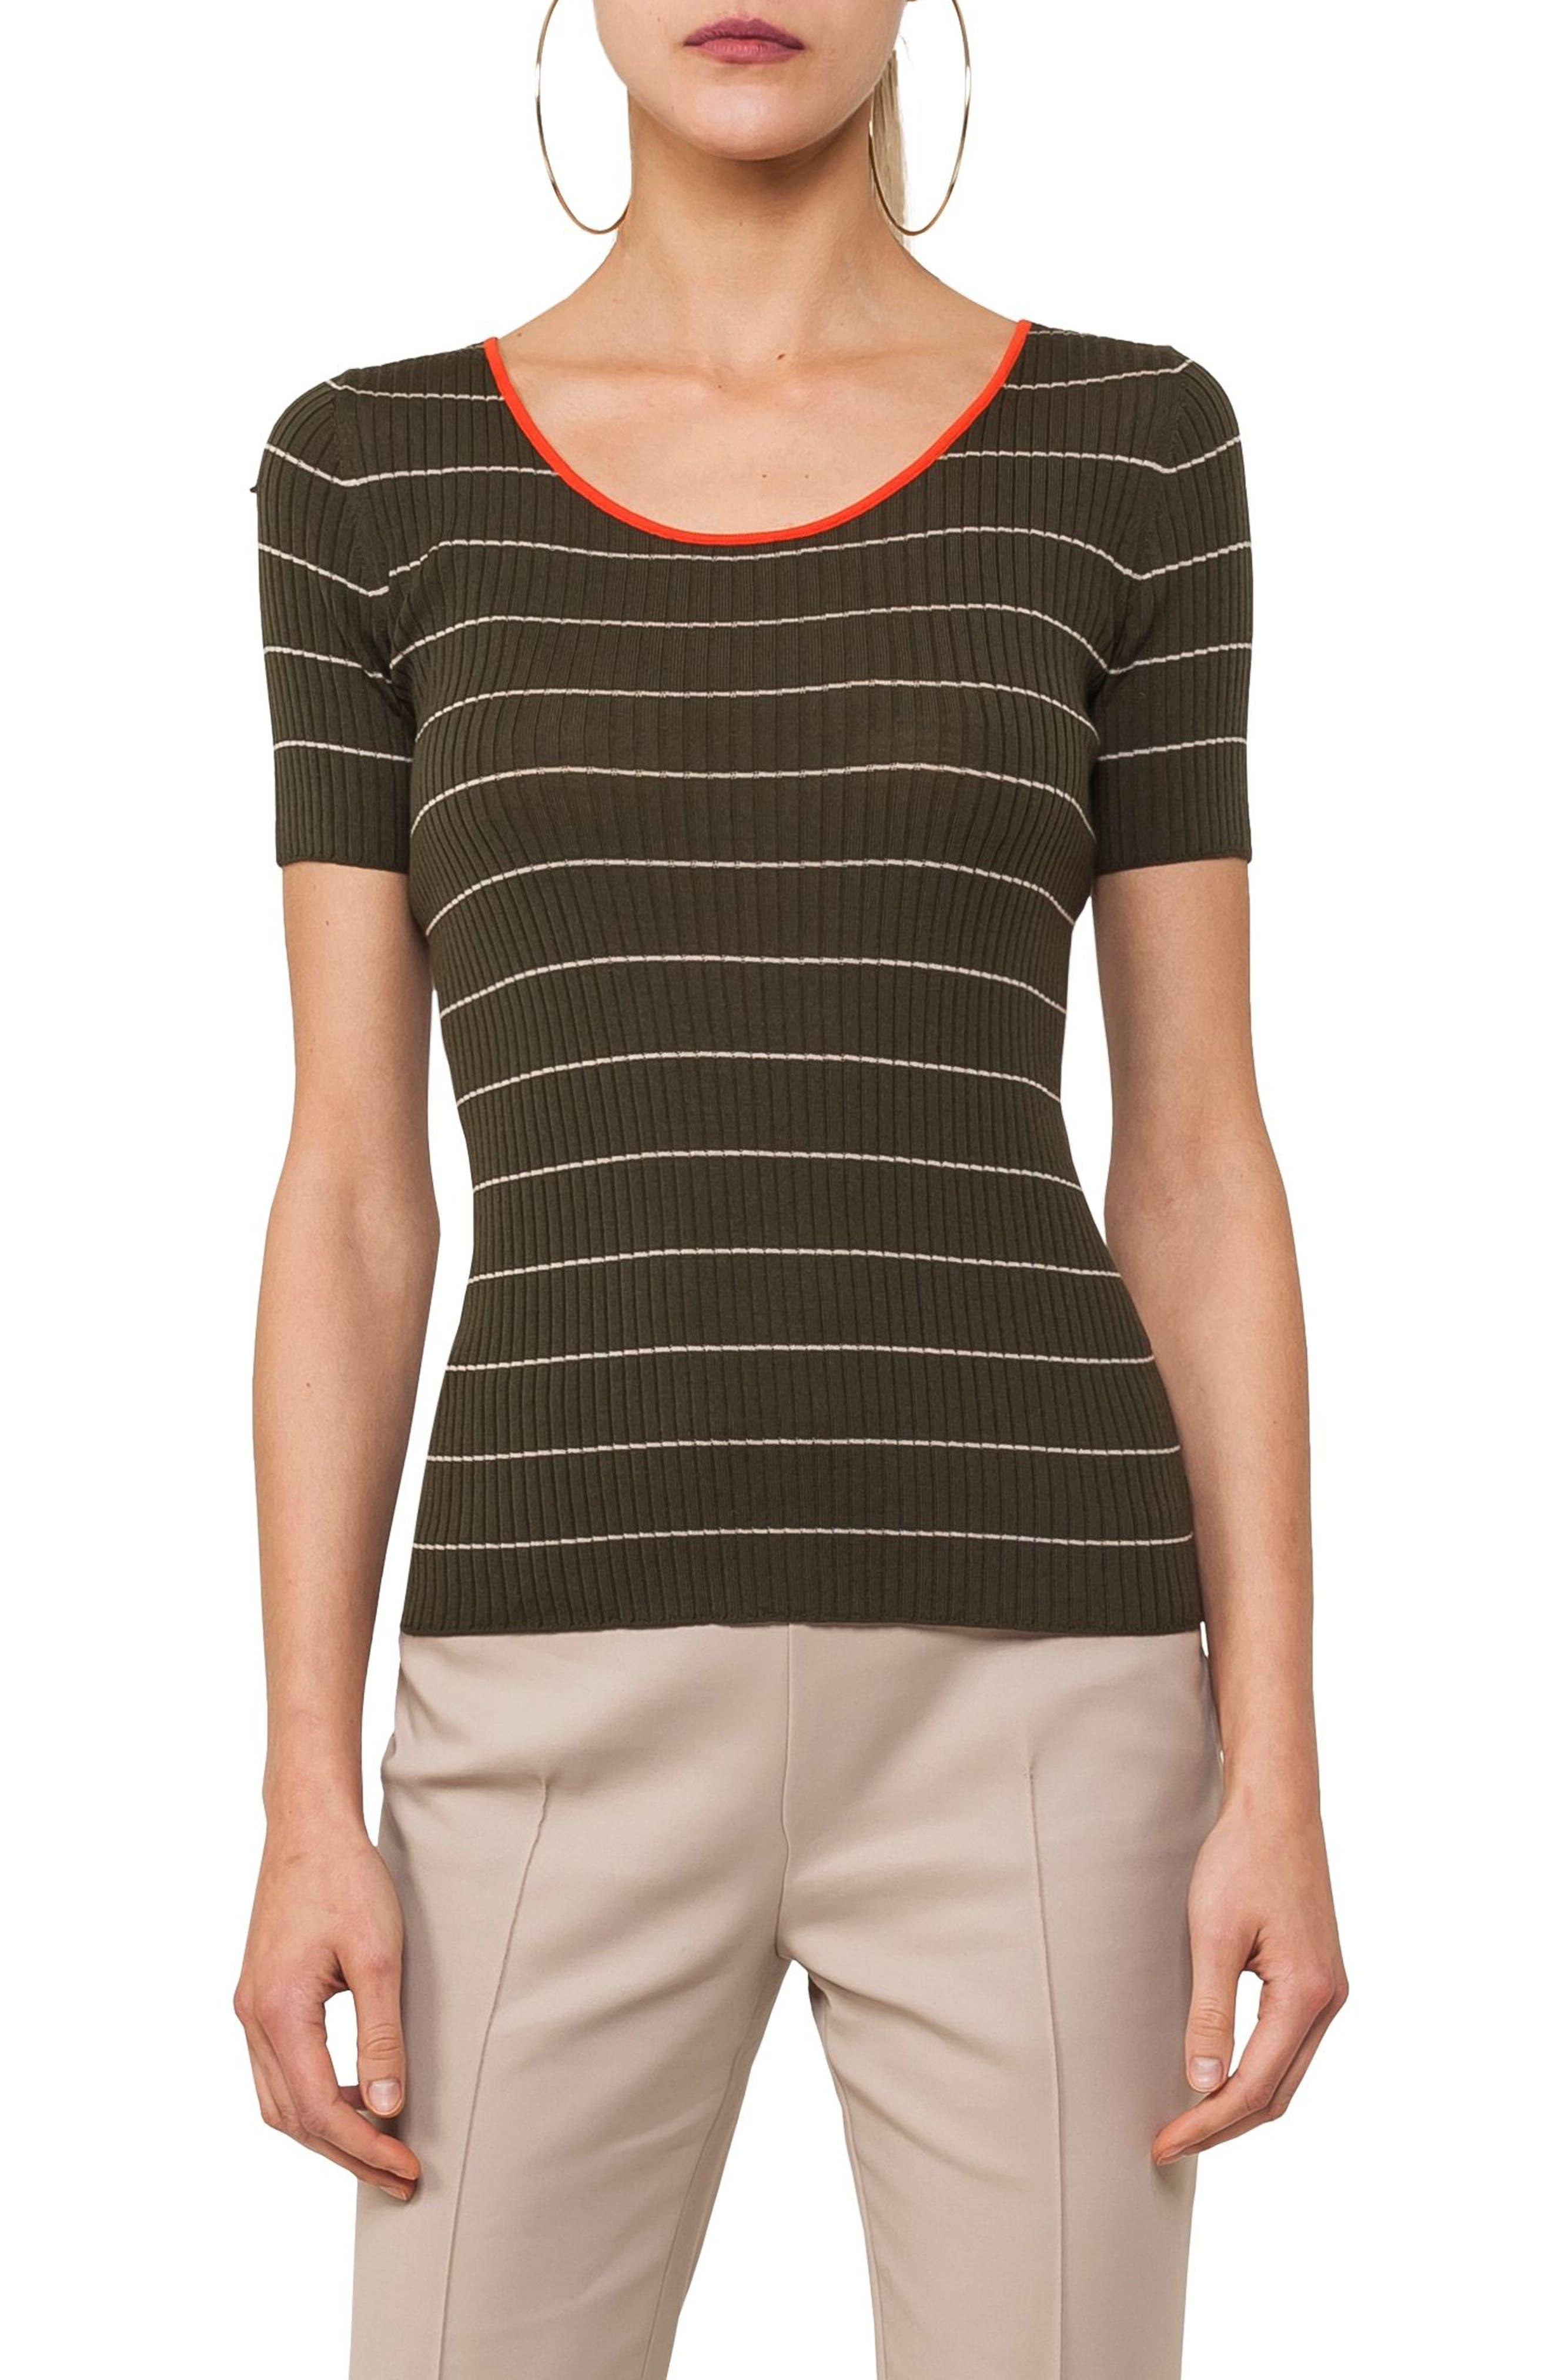 Tricolor Stripe Knit Tee,                             Main thumbnail 1, color,                             Avocado / Sand / Papaya